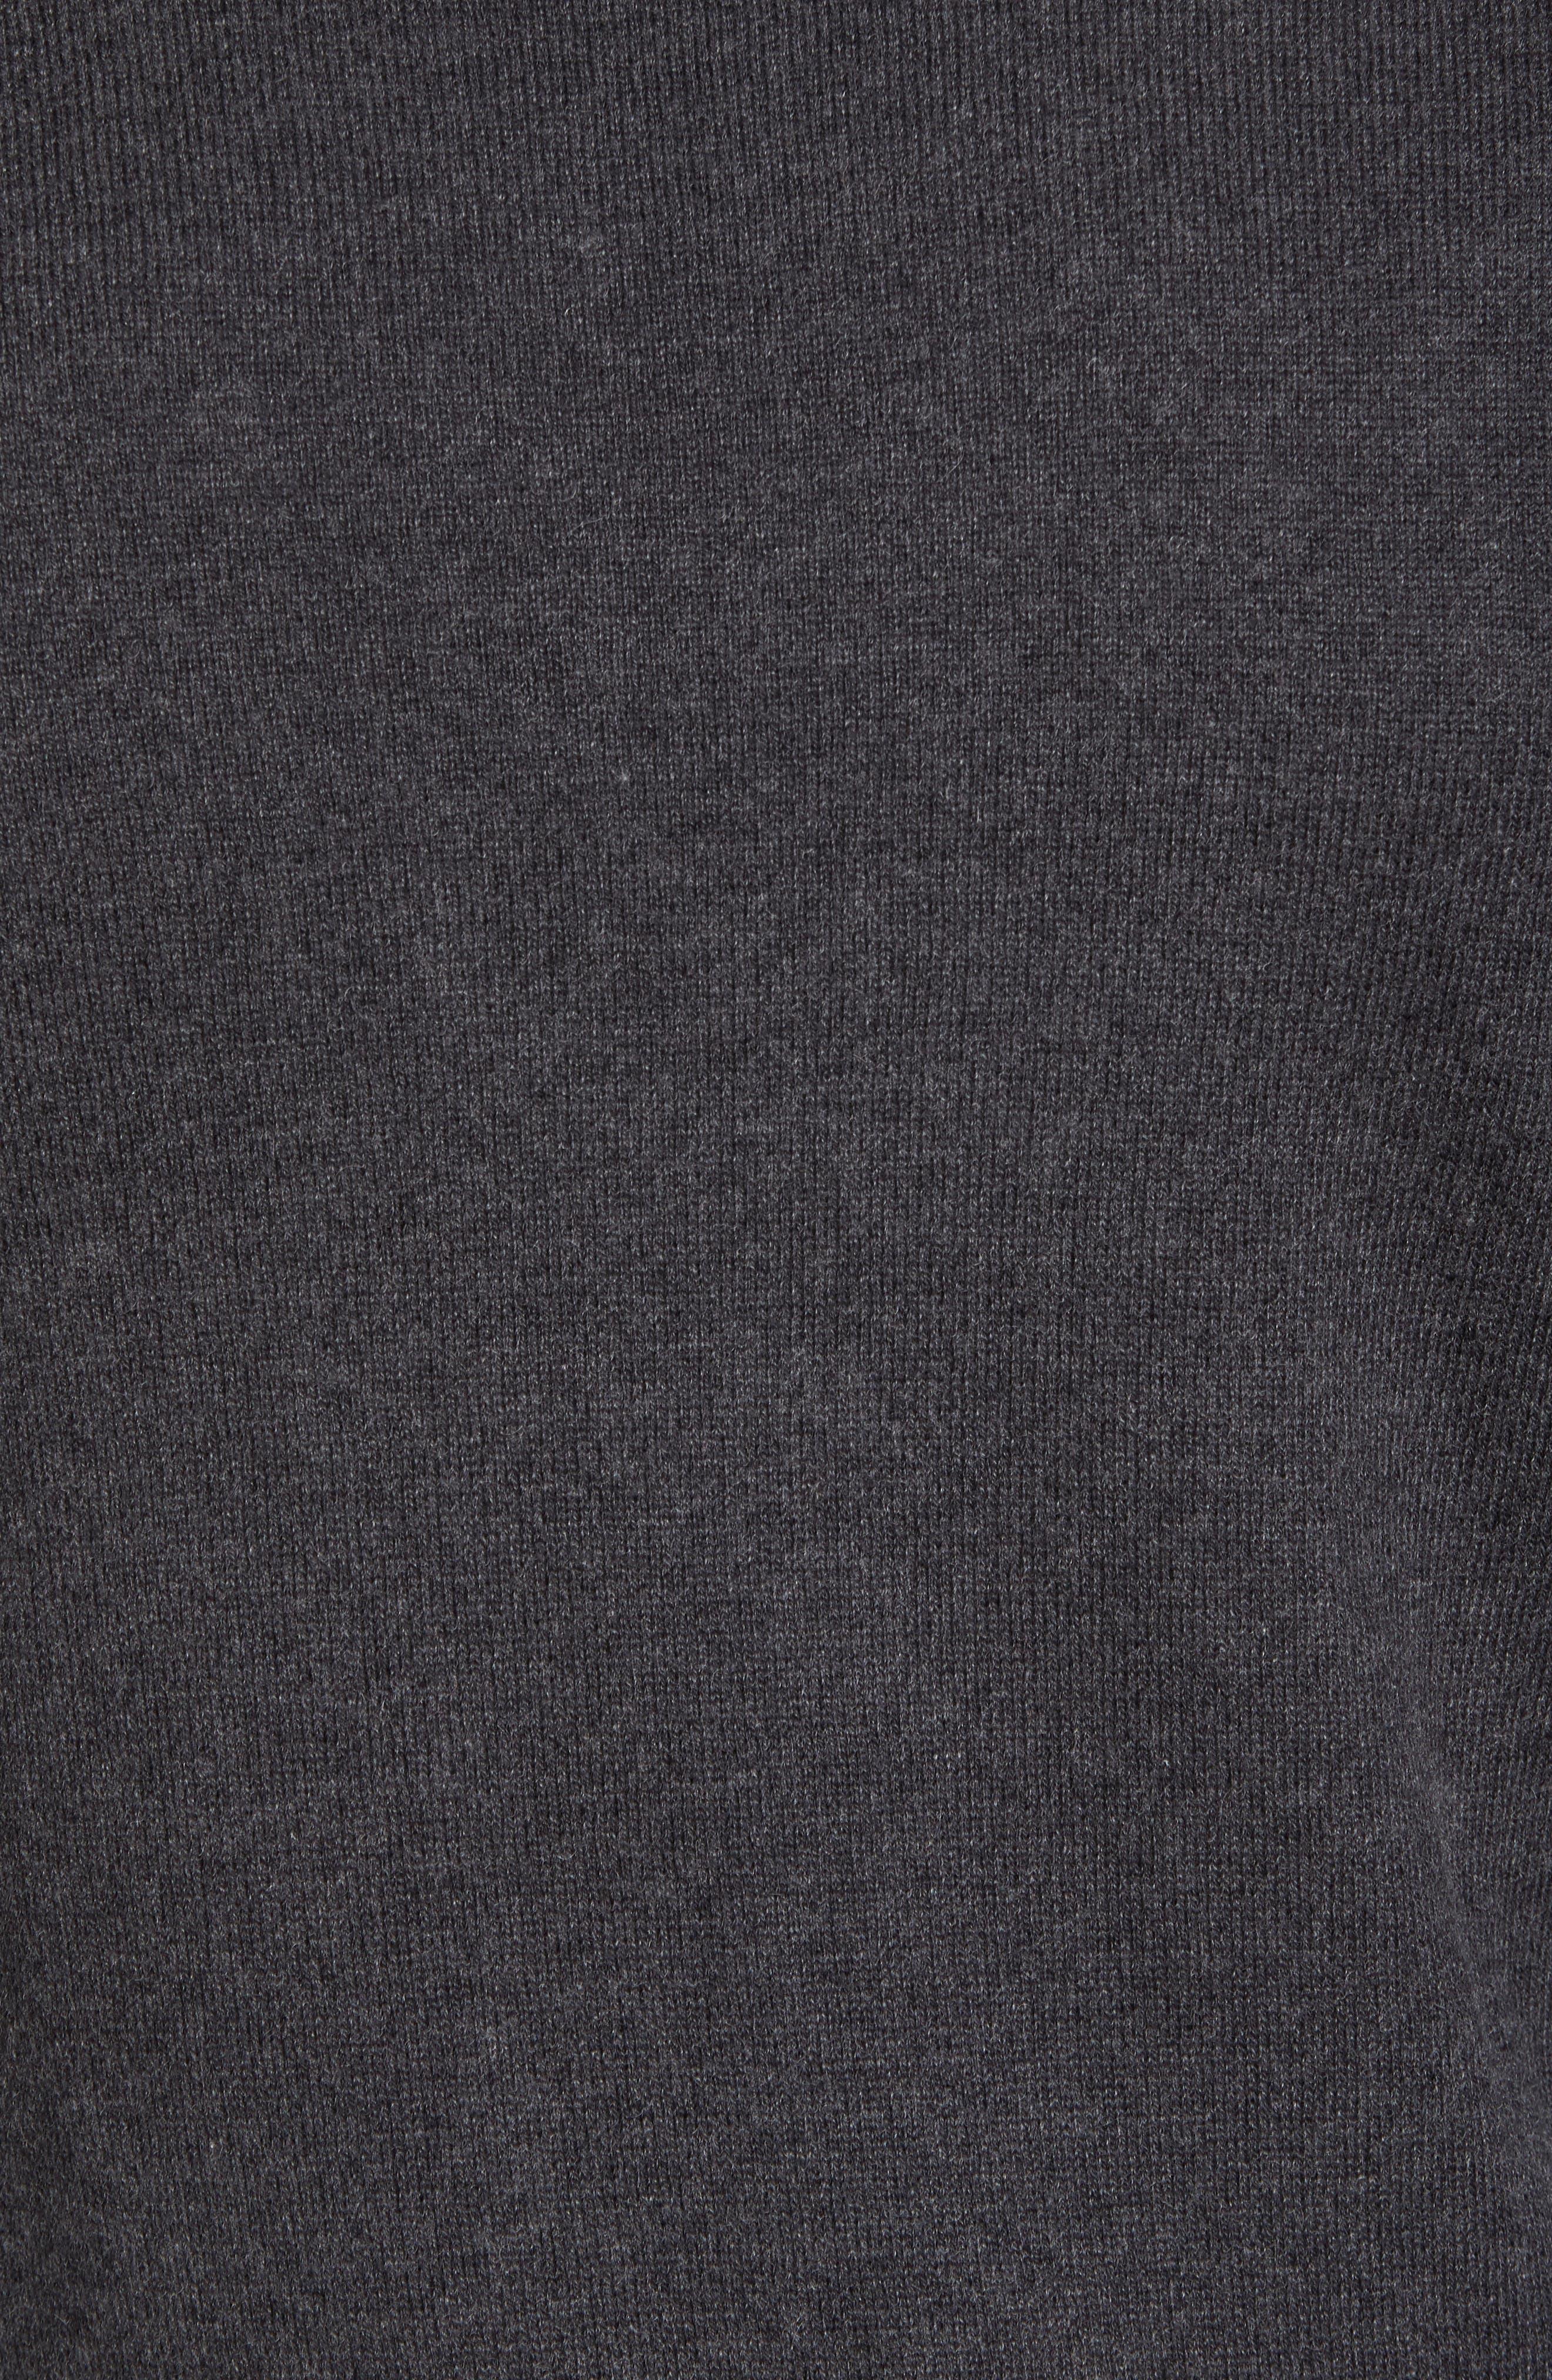 Alternate Image 5  - Bonobos Cotton & Cashmere Quarter Zip Sweater